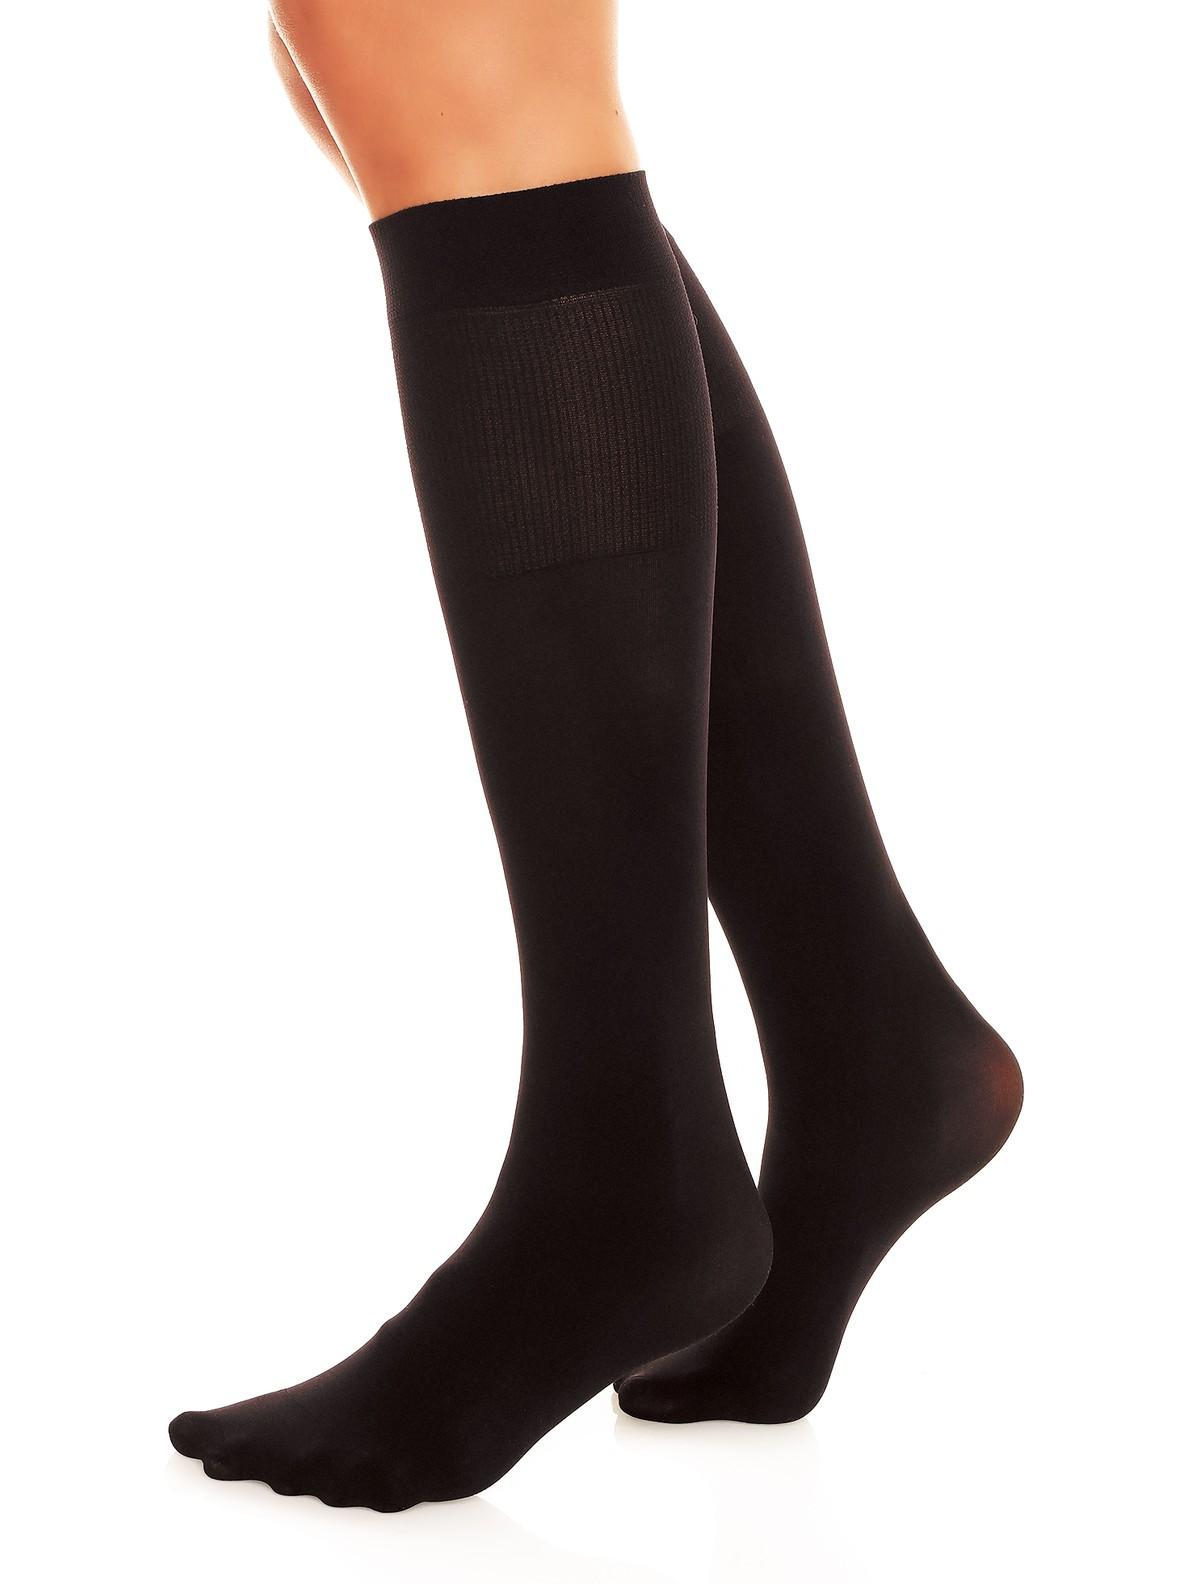 9c7d4ea91cf ... Glamory Fit 50 Microfiber Knee High Socks black ...